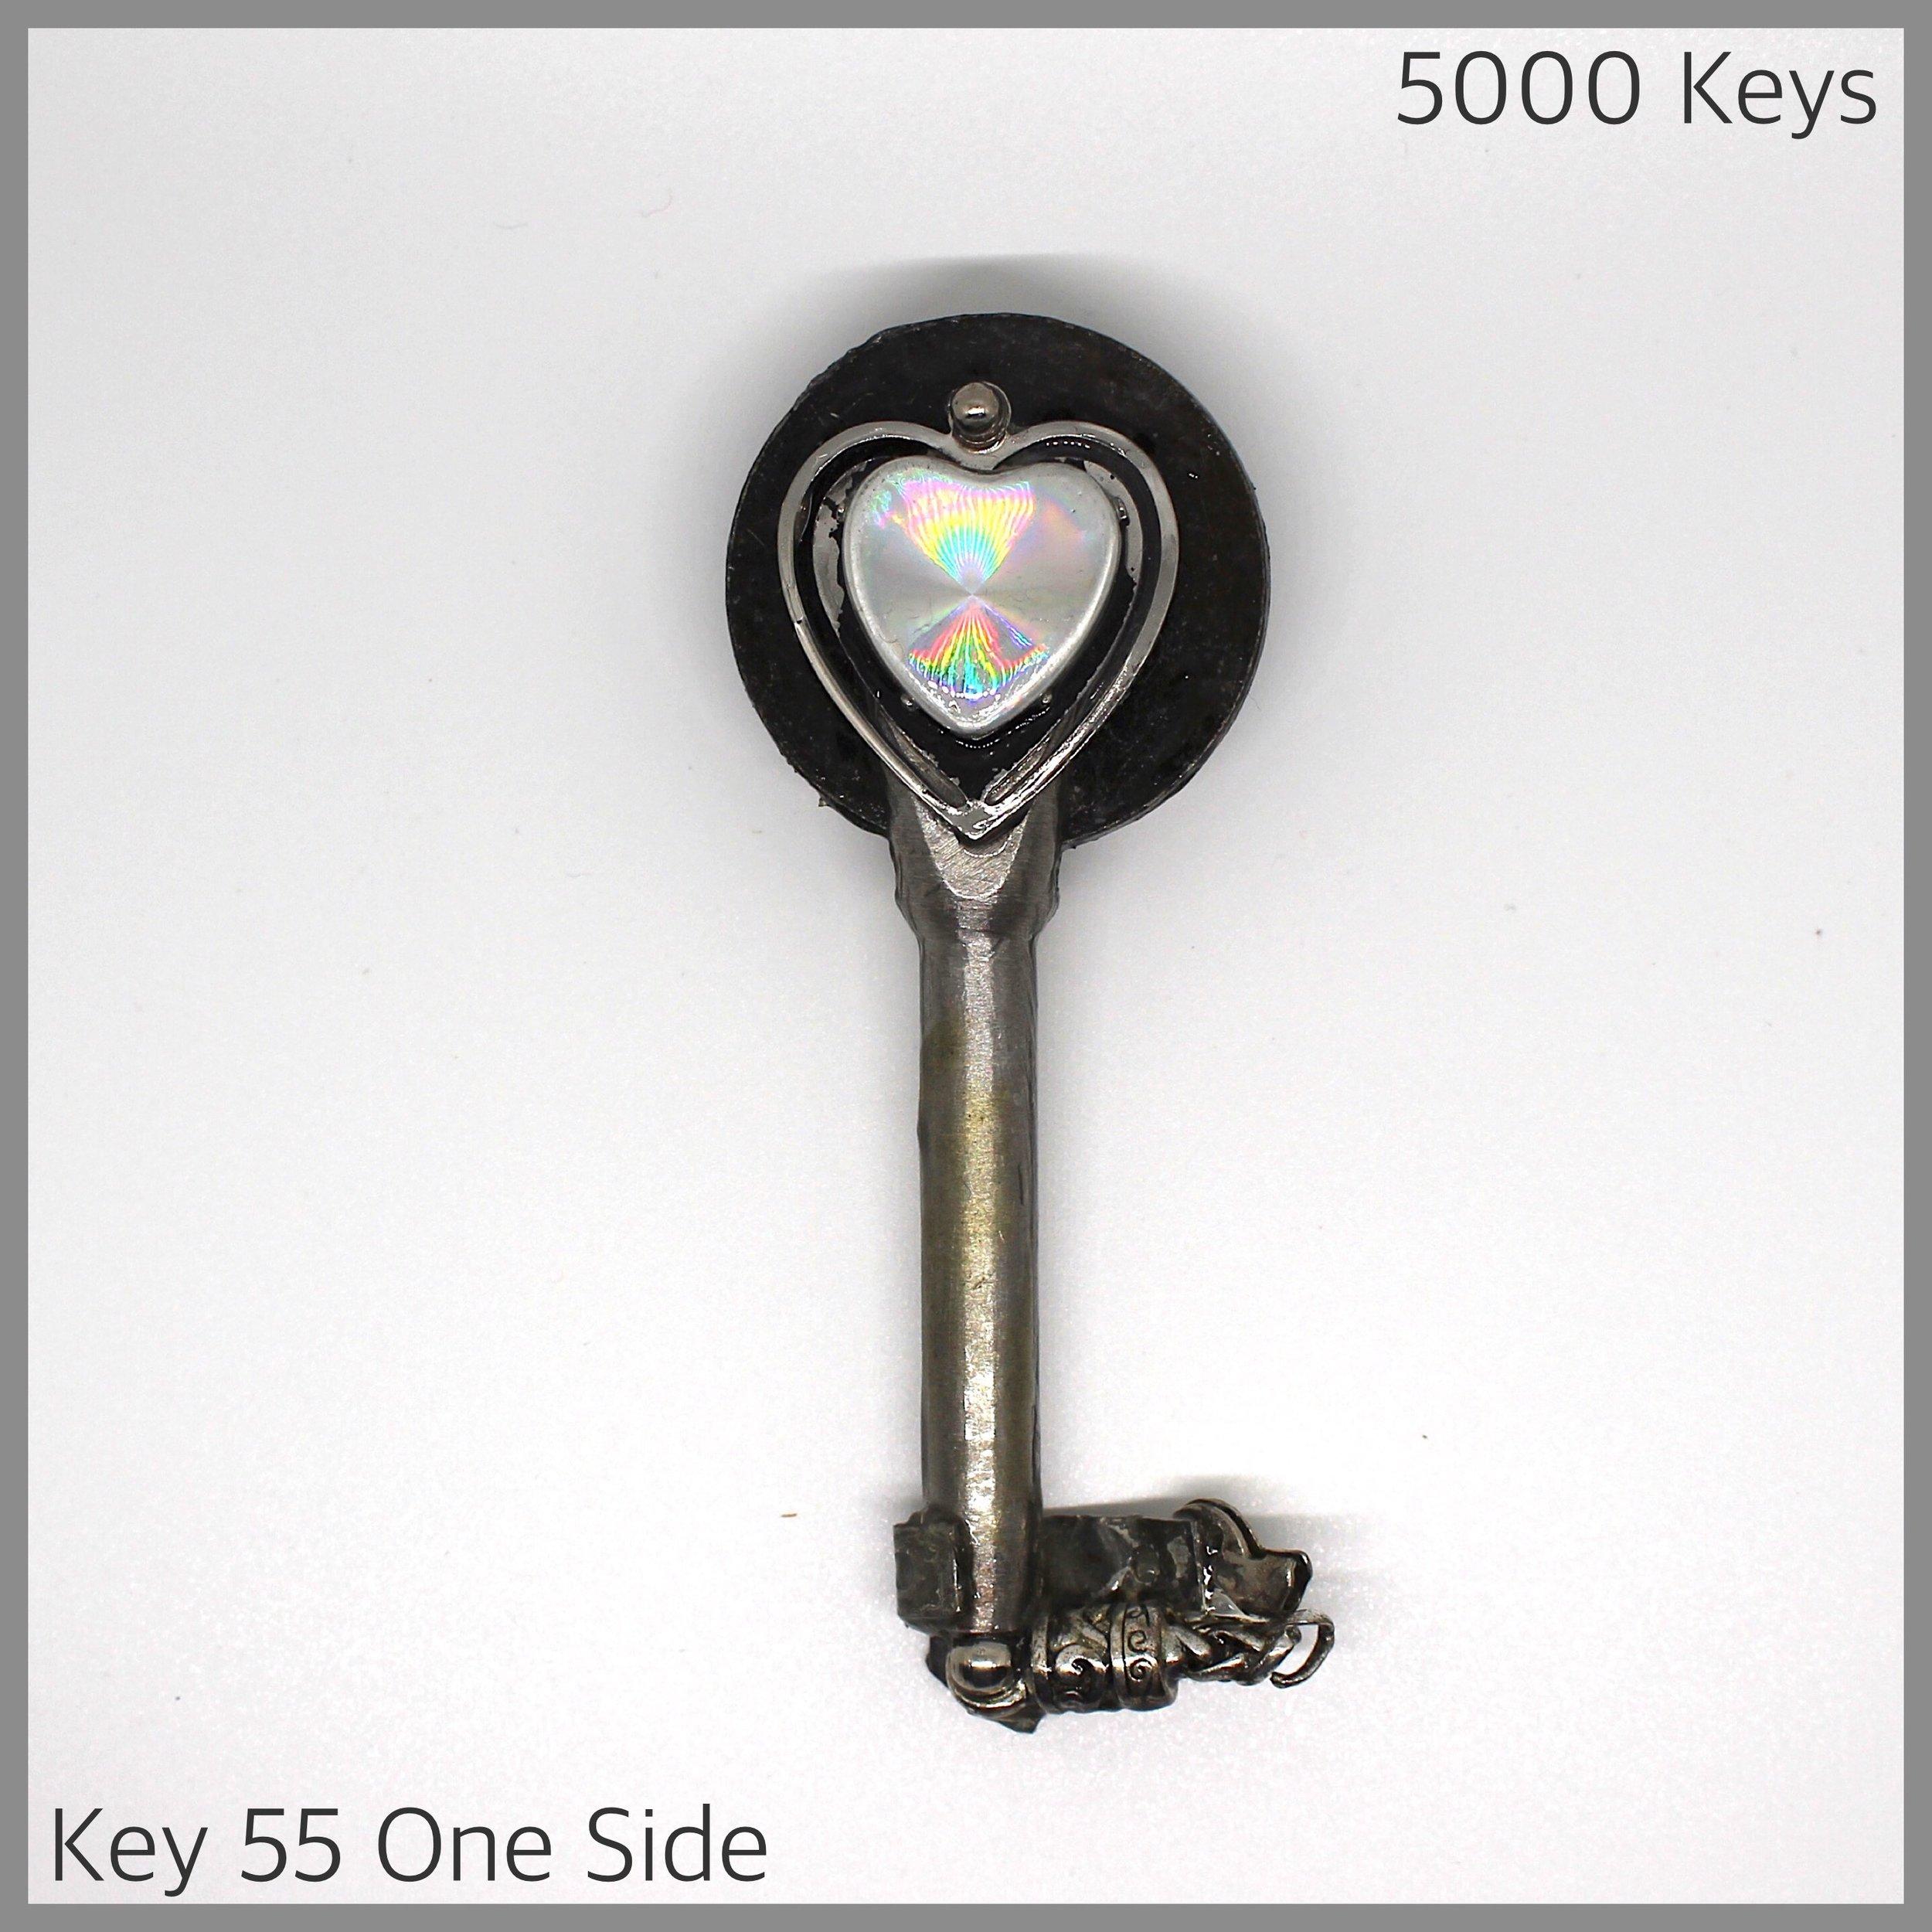 Key 55 one side - 1.JPG